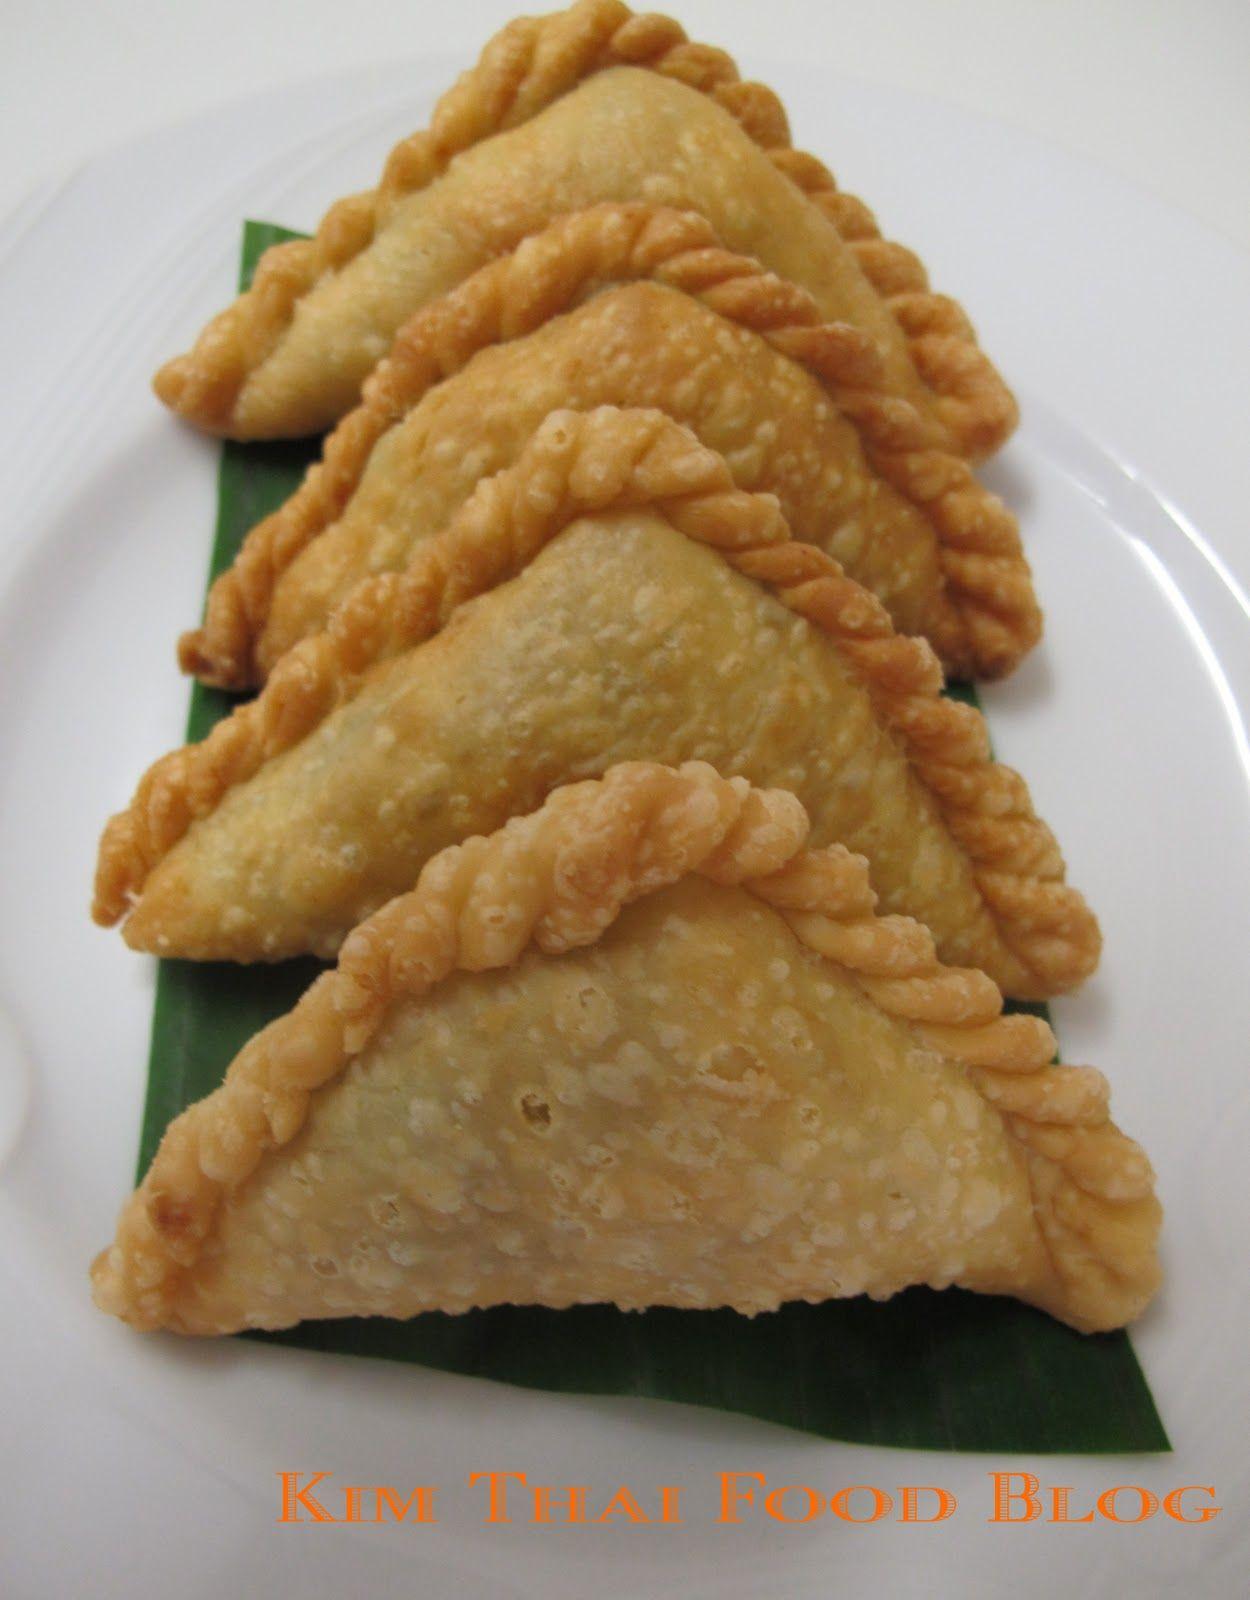 Kim thai food blog curry puff aippaleo foodie fun pinterest kim thai food blog curry puff forumfinder Gallery